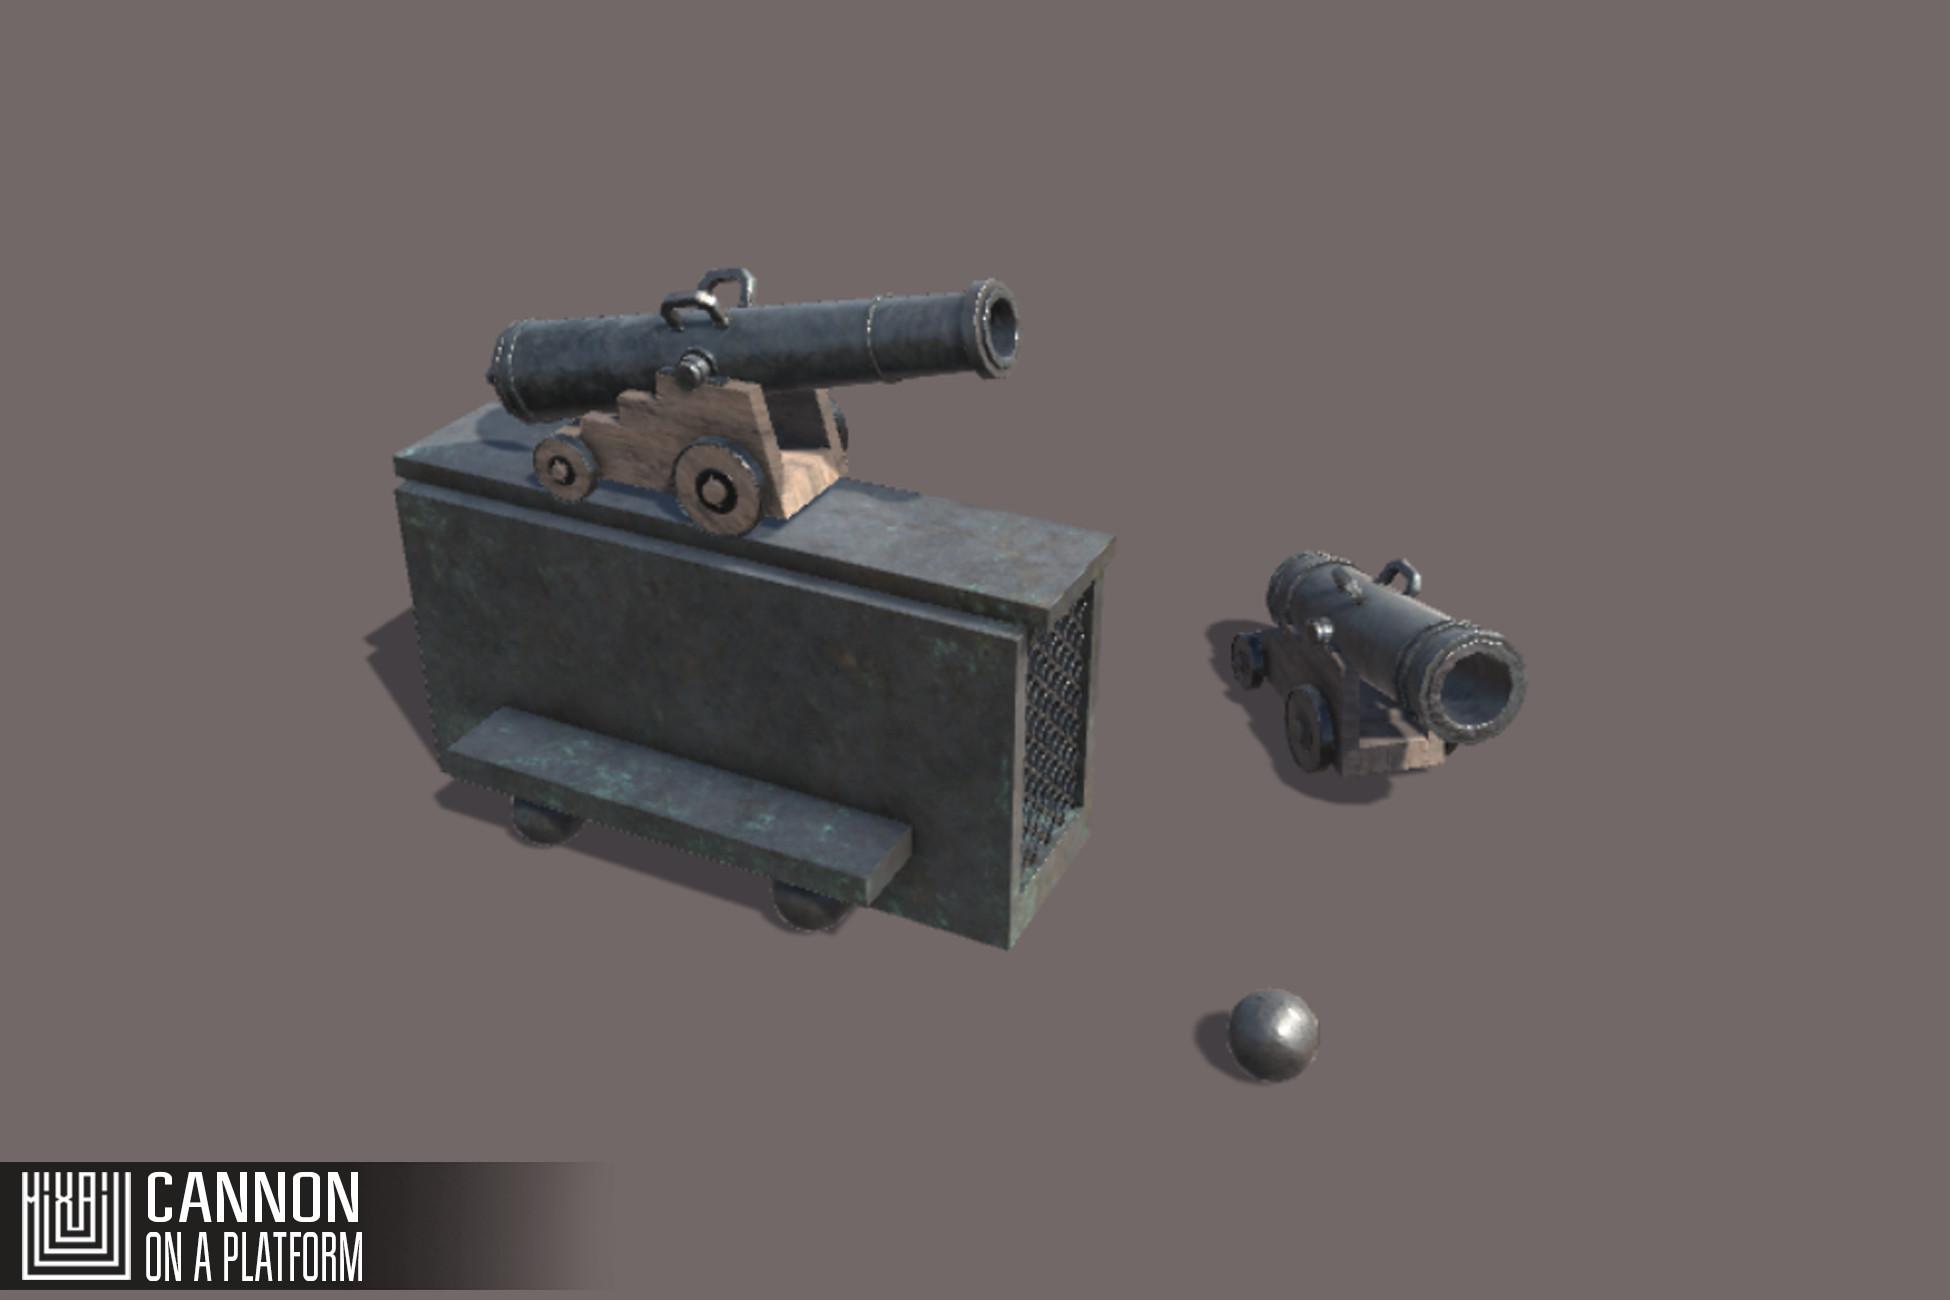 Cannon on a Platform